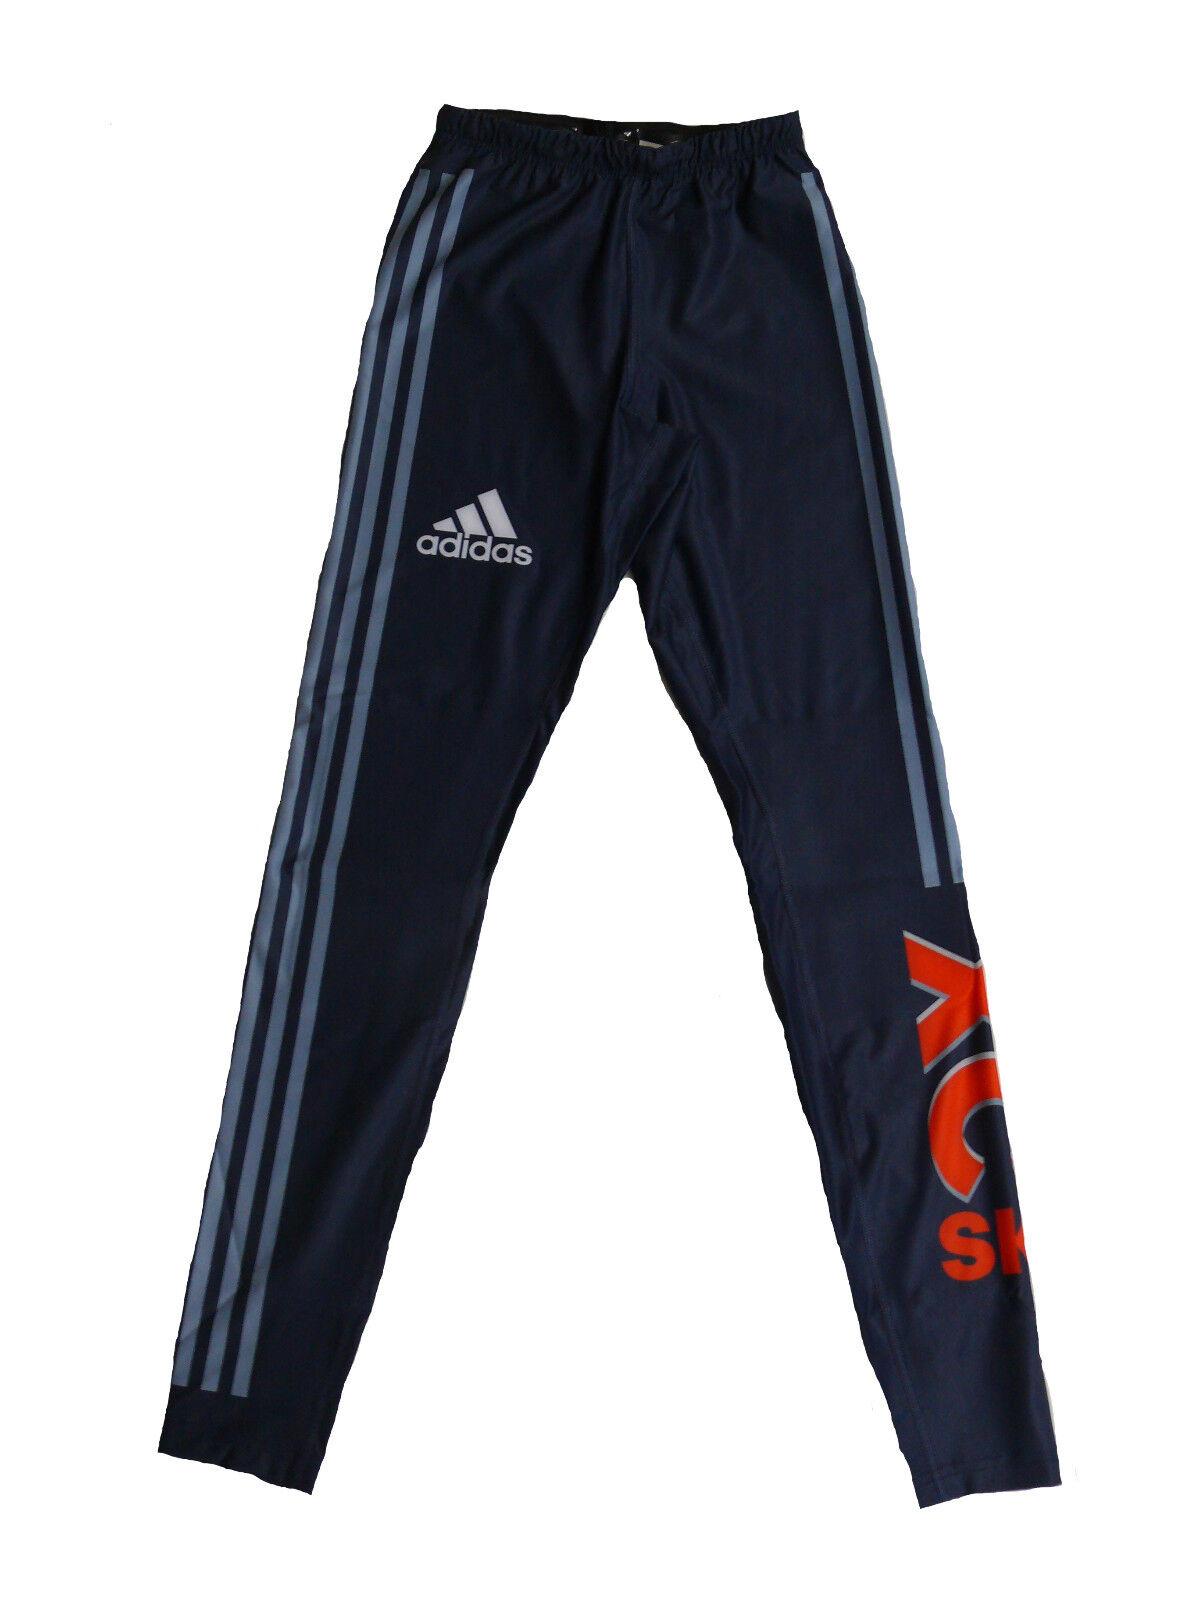 Adidas Herren Race Langlauf Tights Hose Gr.4 (S)